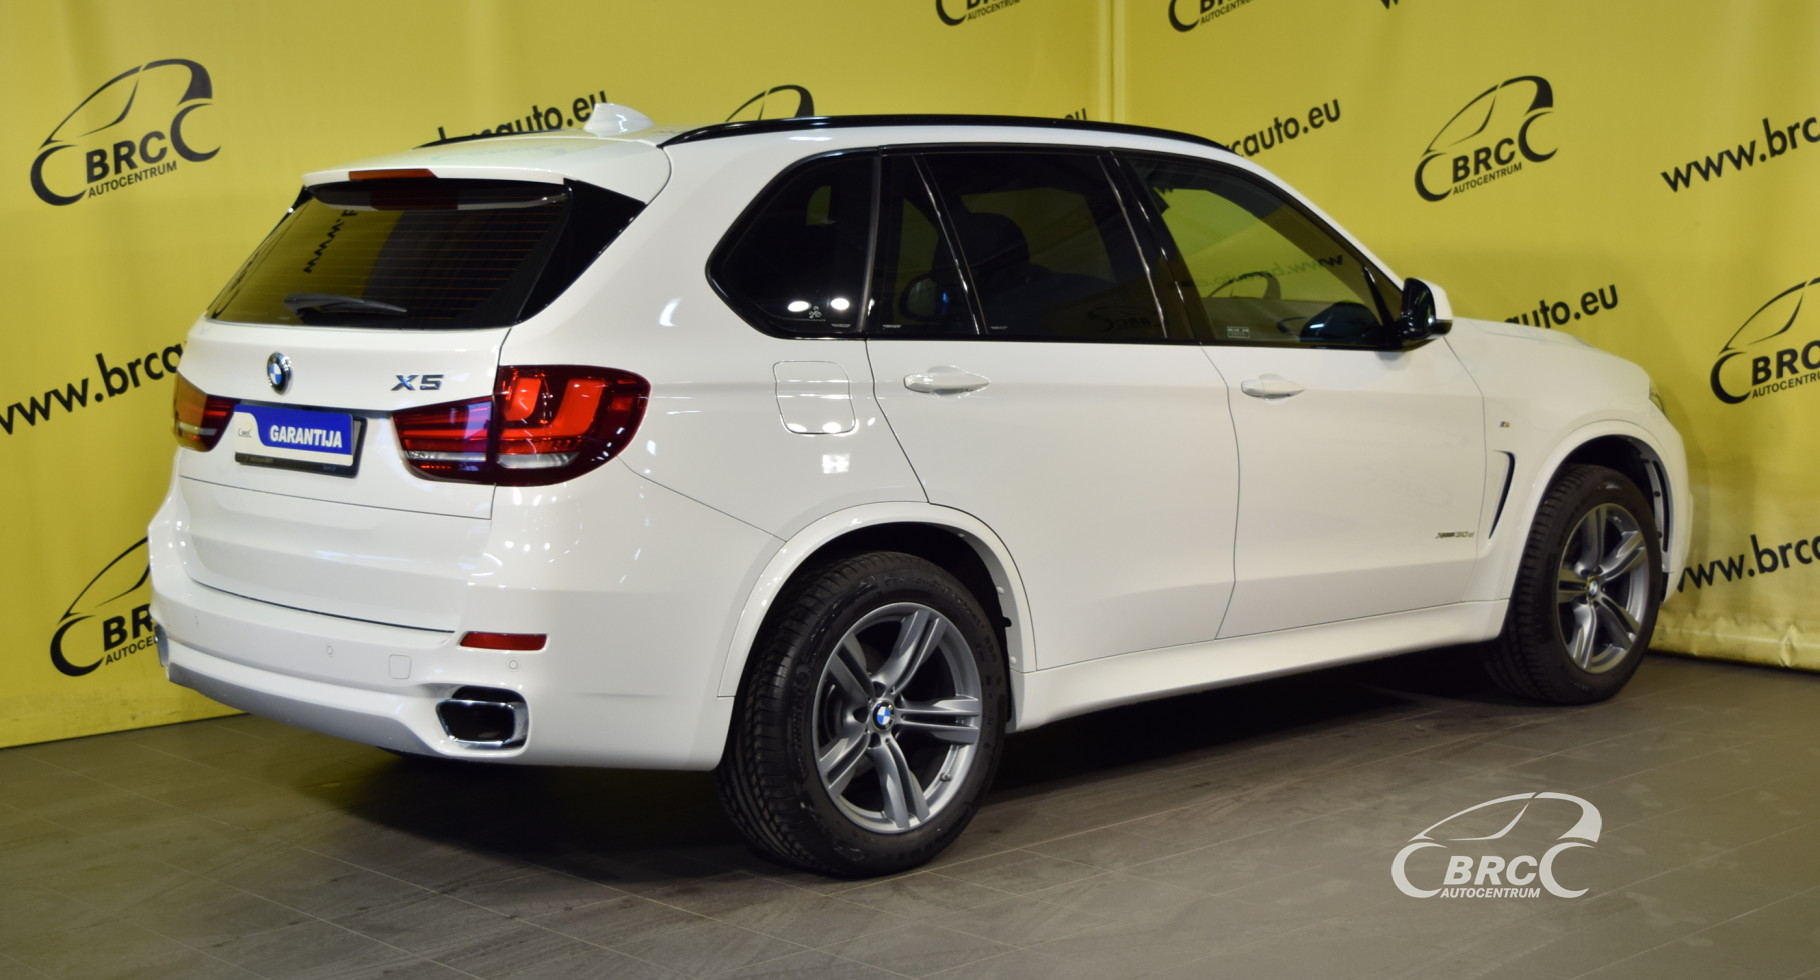 BMW X5 xDrive 30d M-Pakete (ID: 800447) | BRC Autocentrum